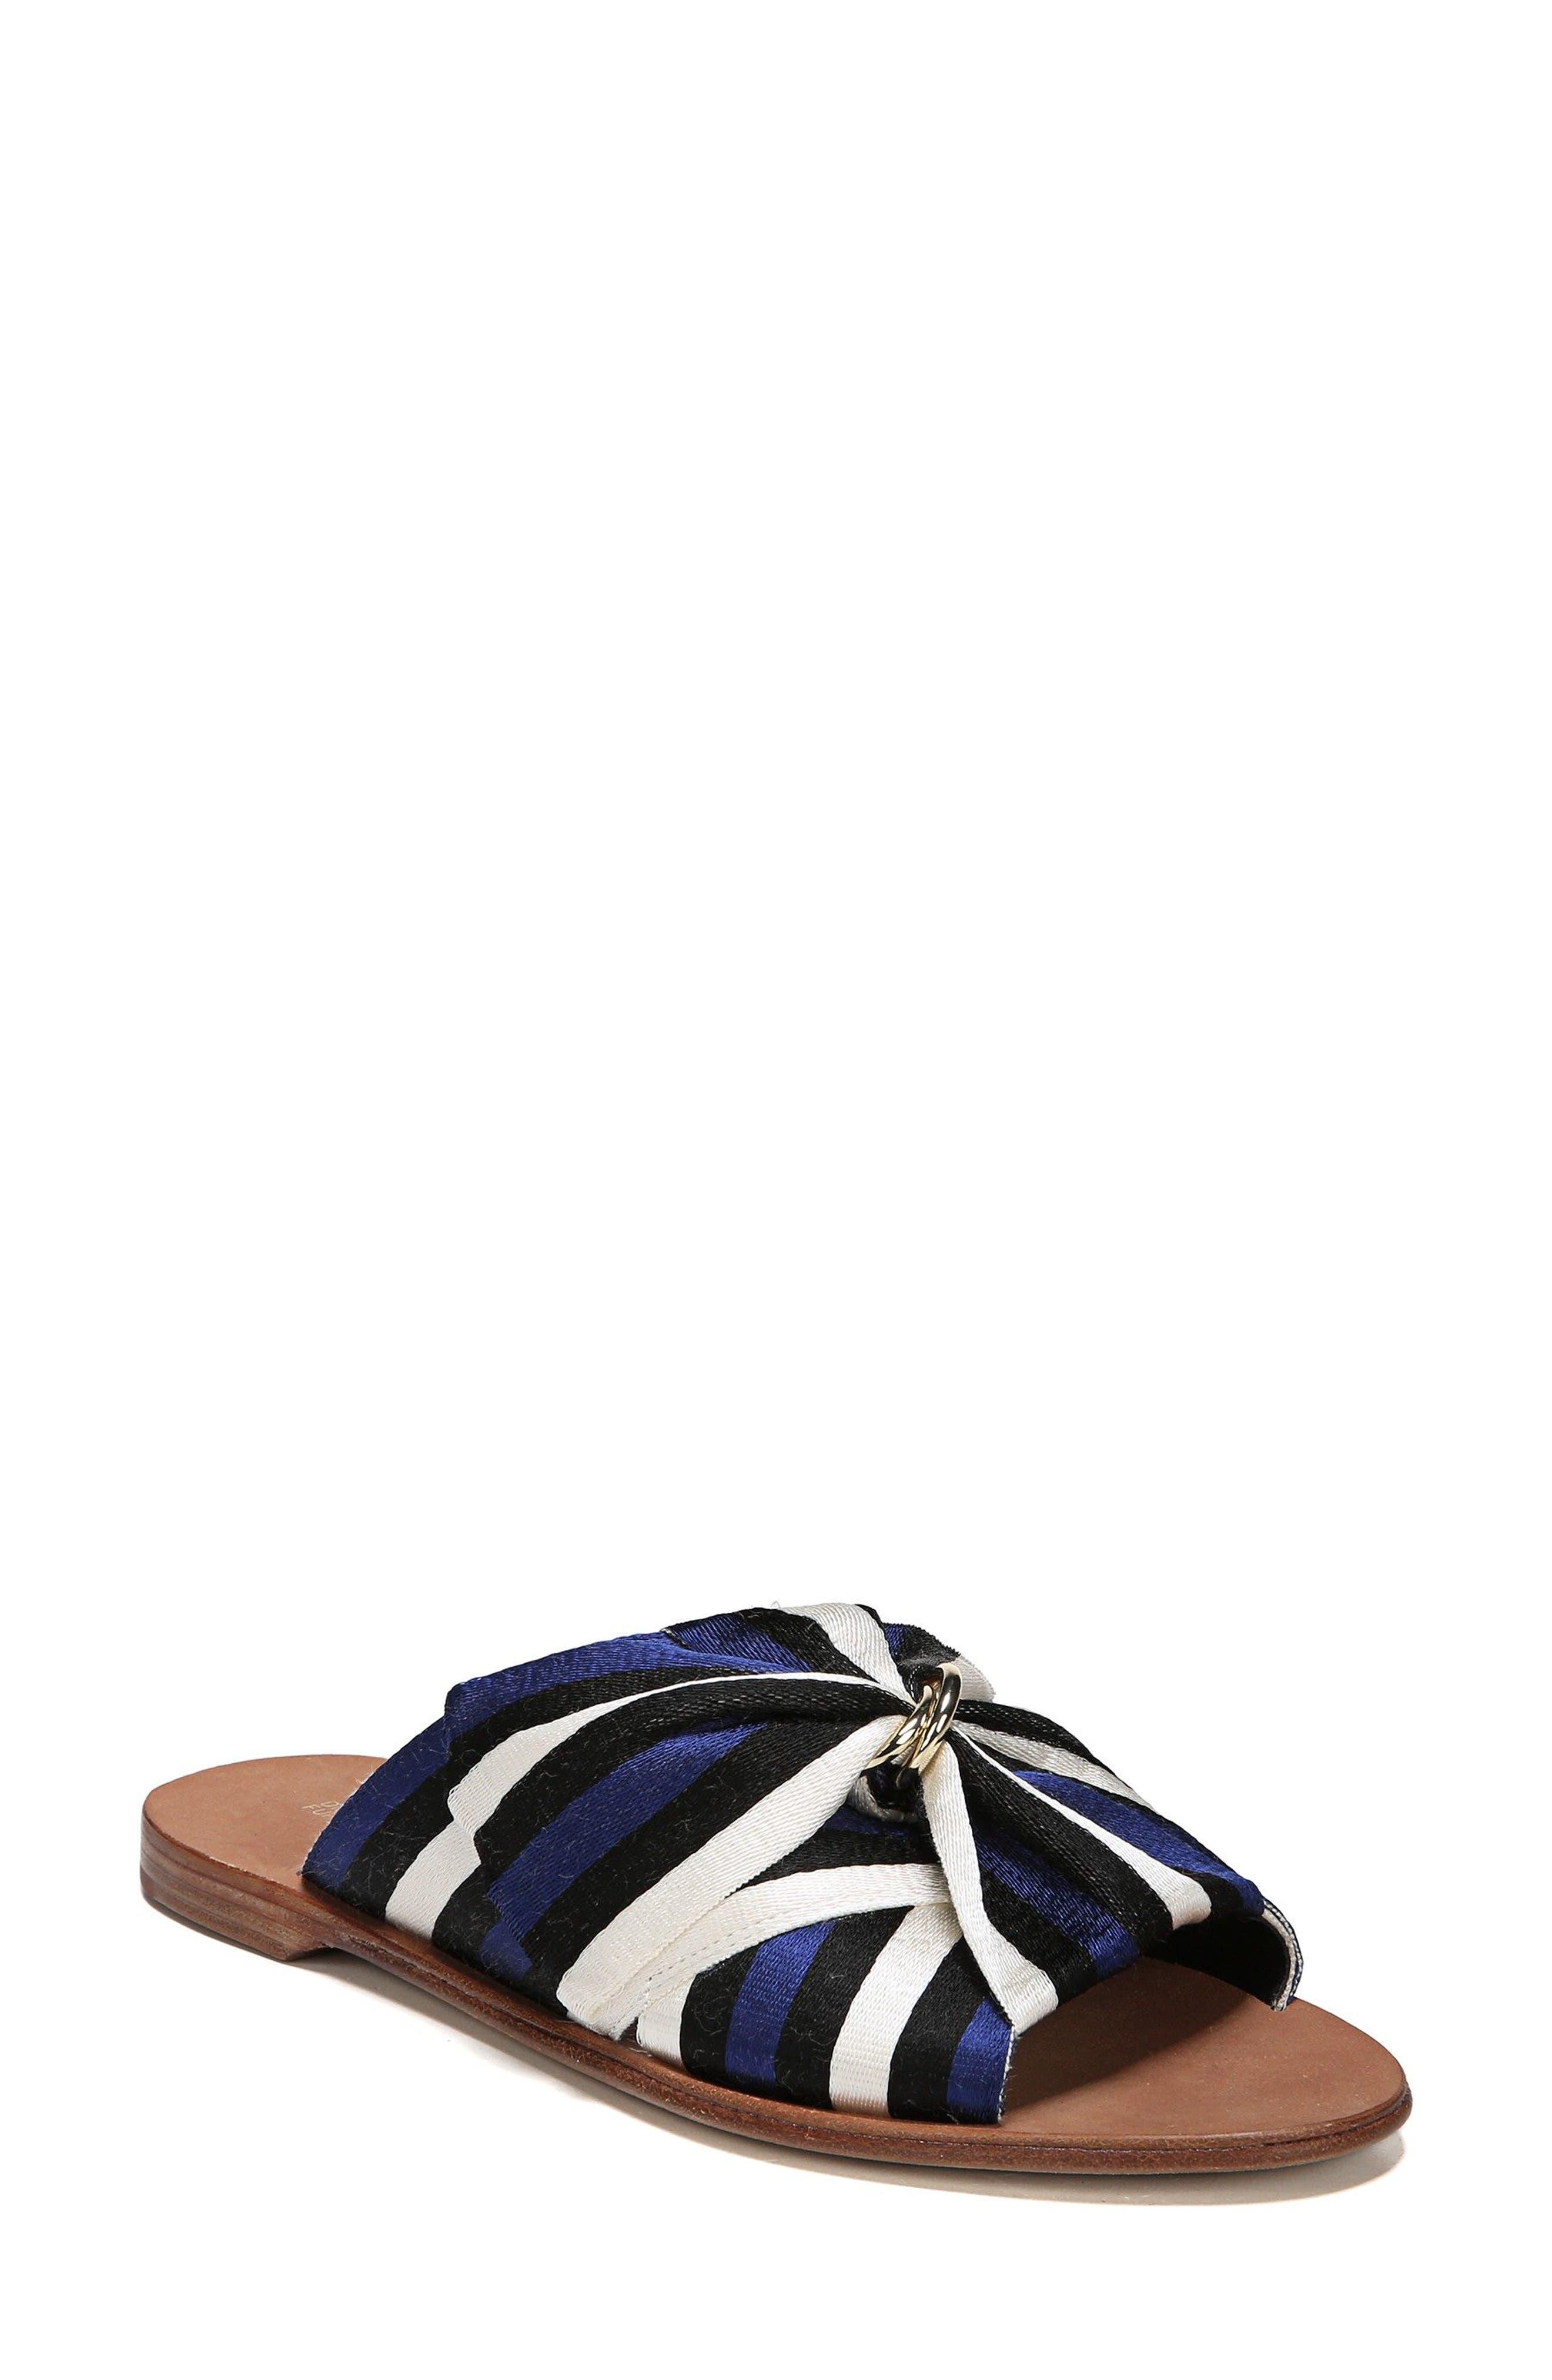 Bella Asymmetrical Slide Sandal,                         Main,                         color, 400